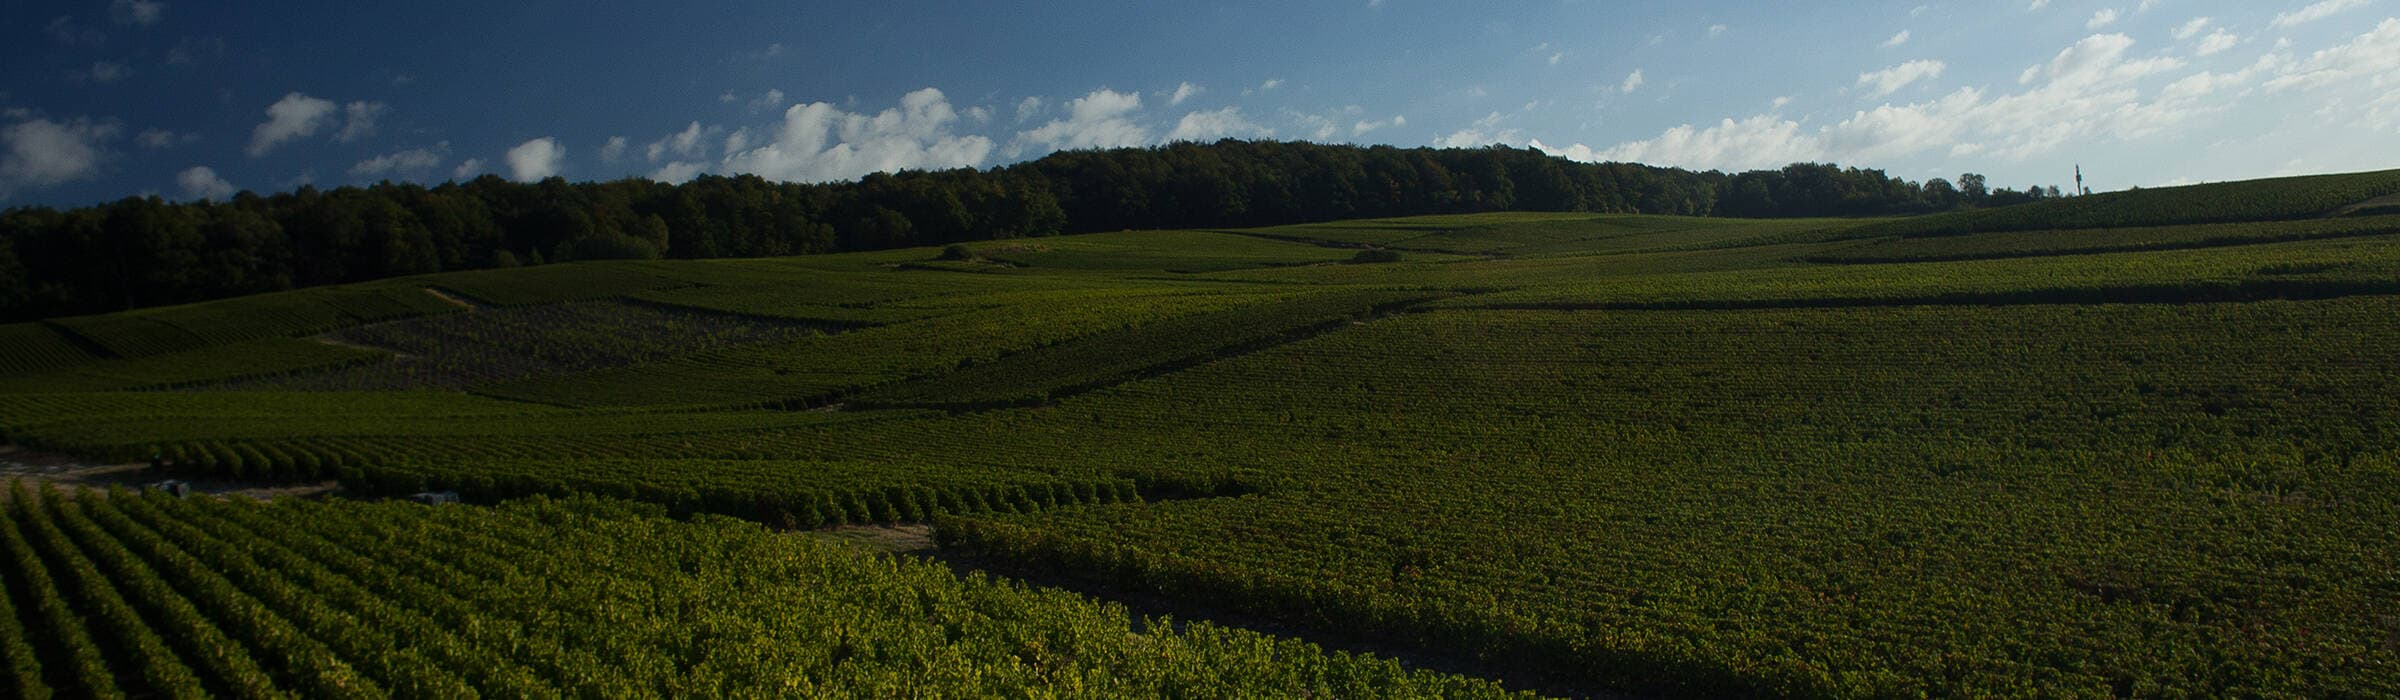 Veuve Clicquot - Le vignoble